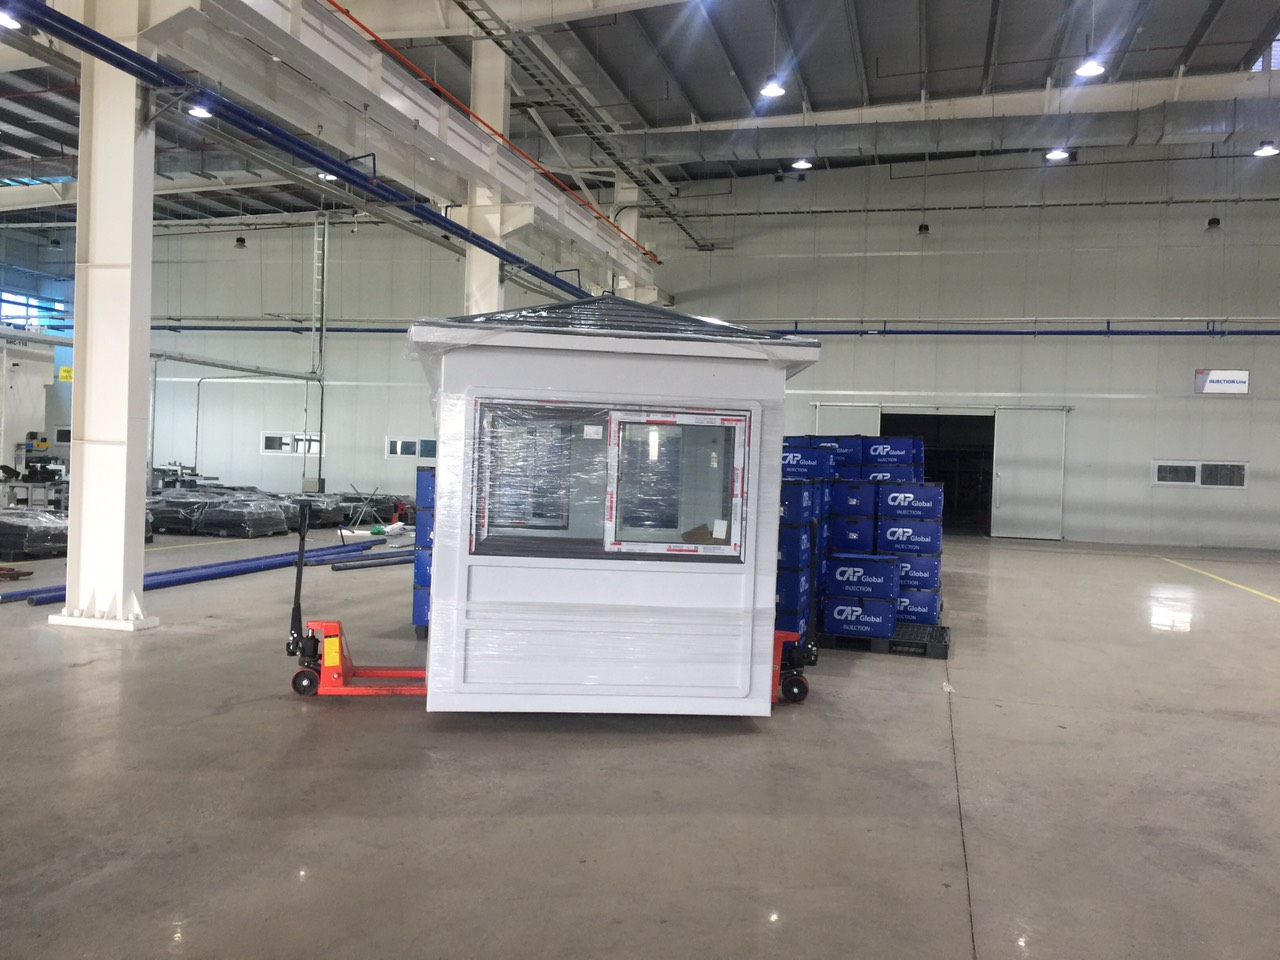 Cabin bảo vệ cao cấp Handy Booths